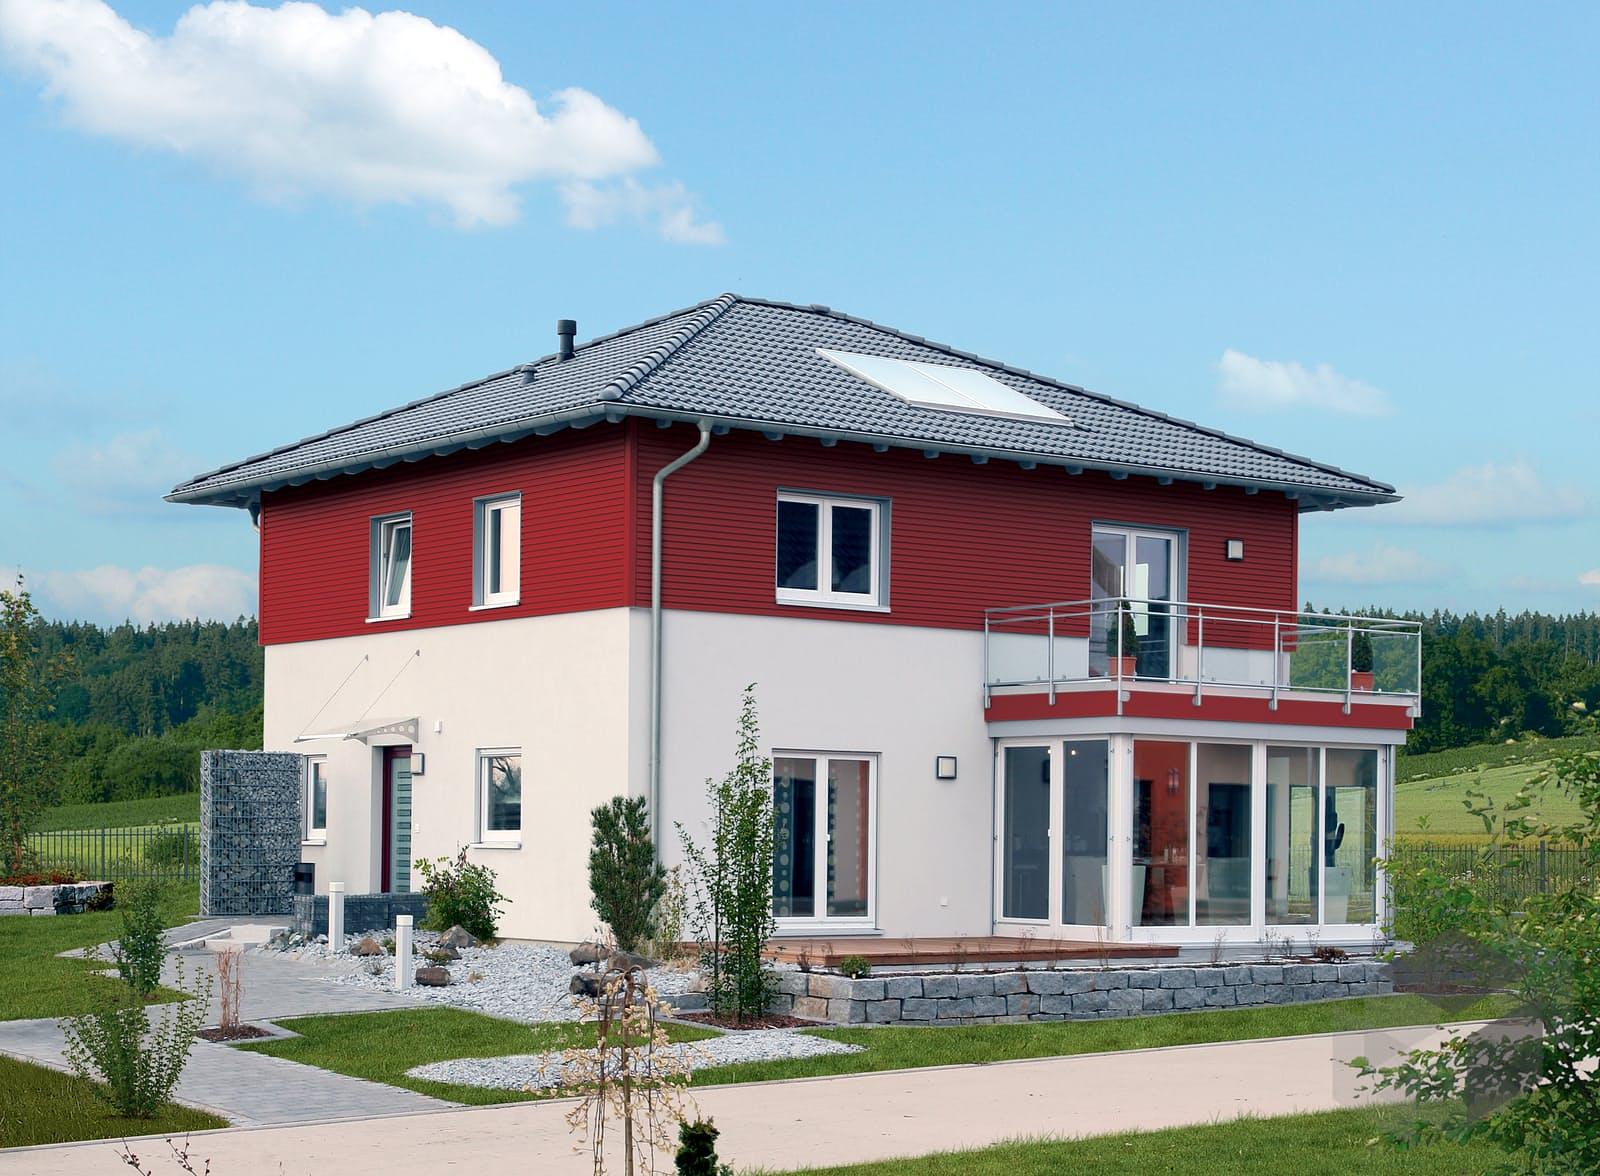 medley 3 0 300b w musterhaus n rnberg von fingerhaus komplette daten bersicht. Black Bedroom Furniture Sets. Home Design Ideas